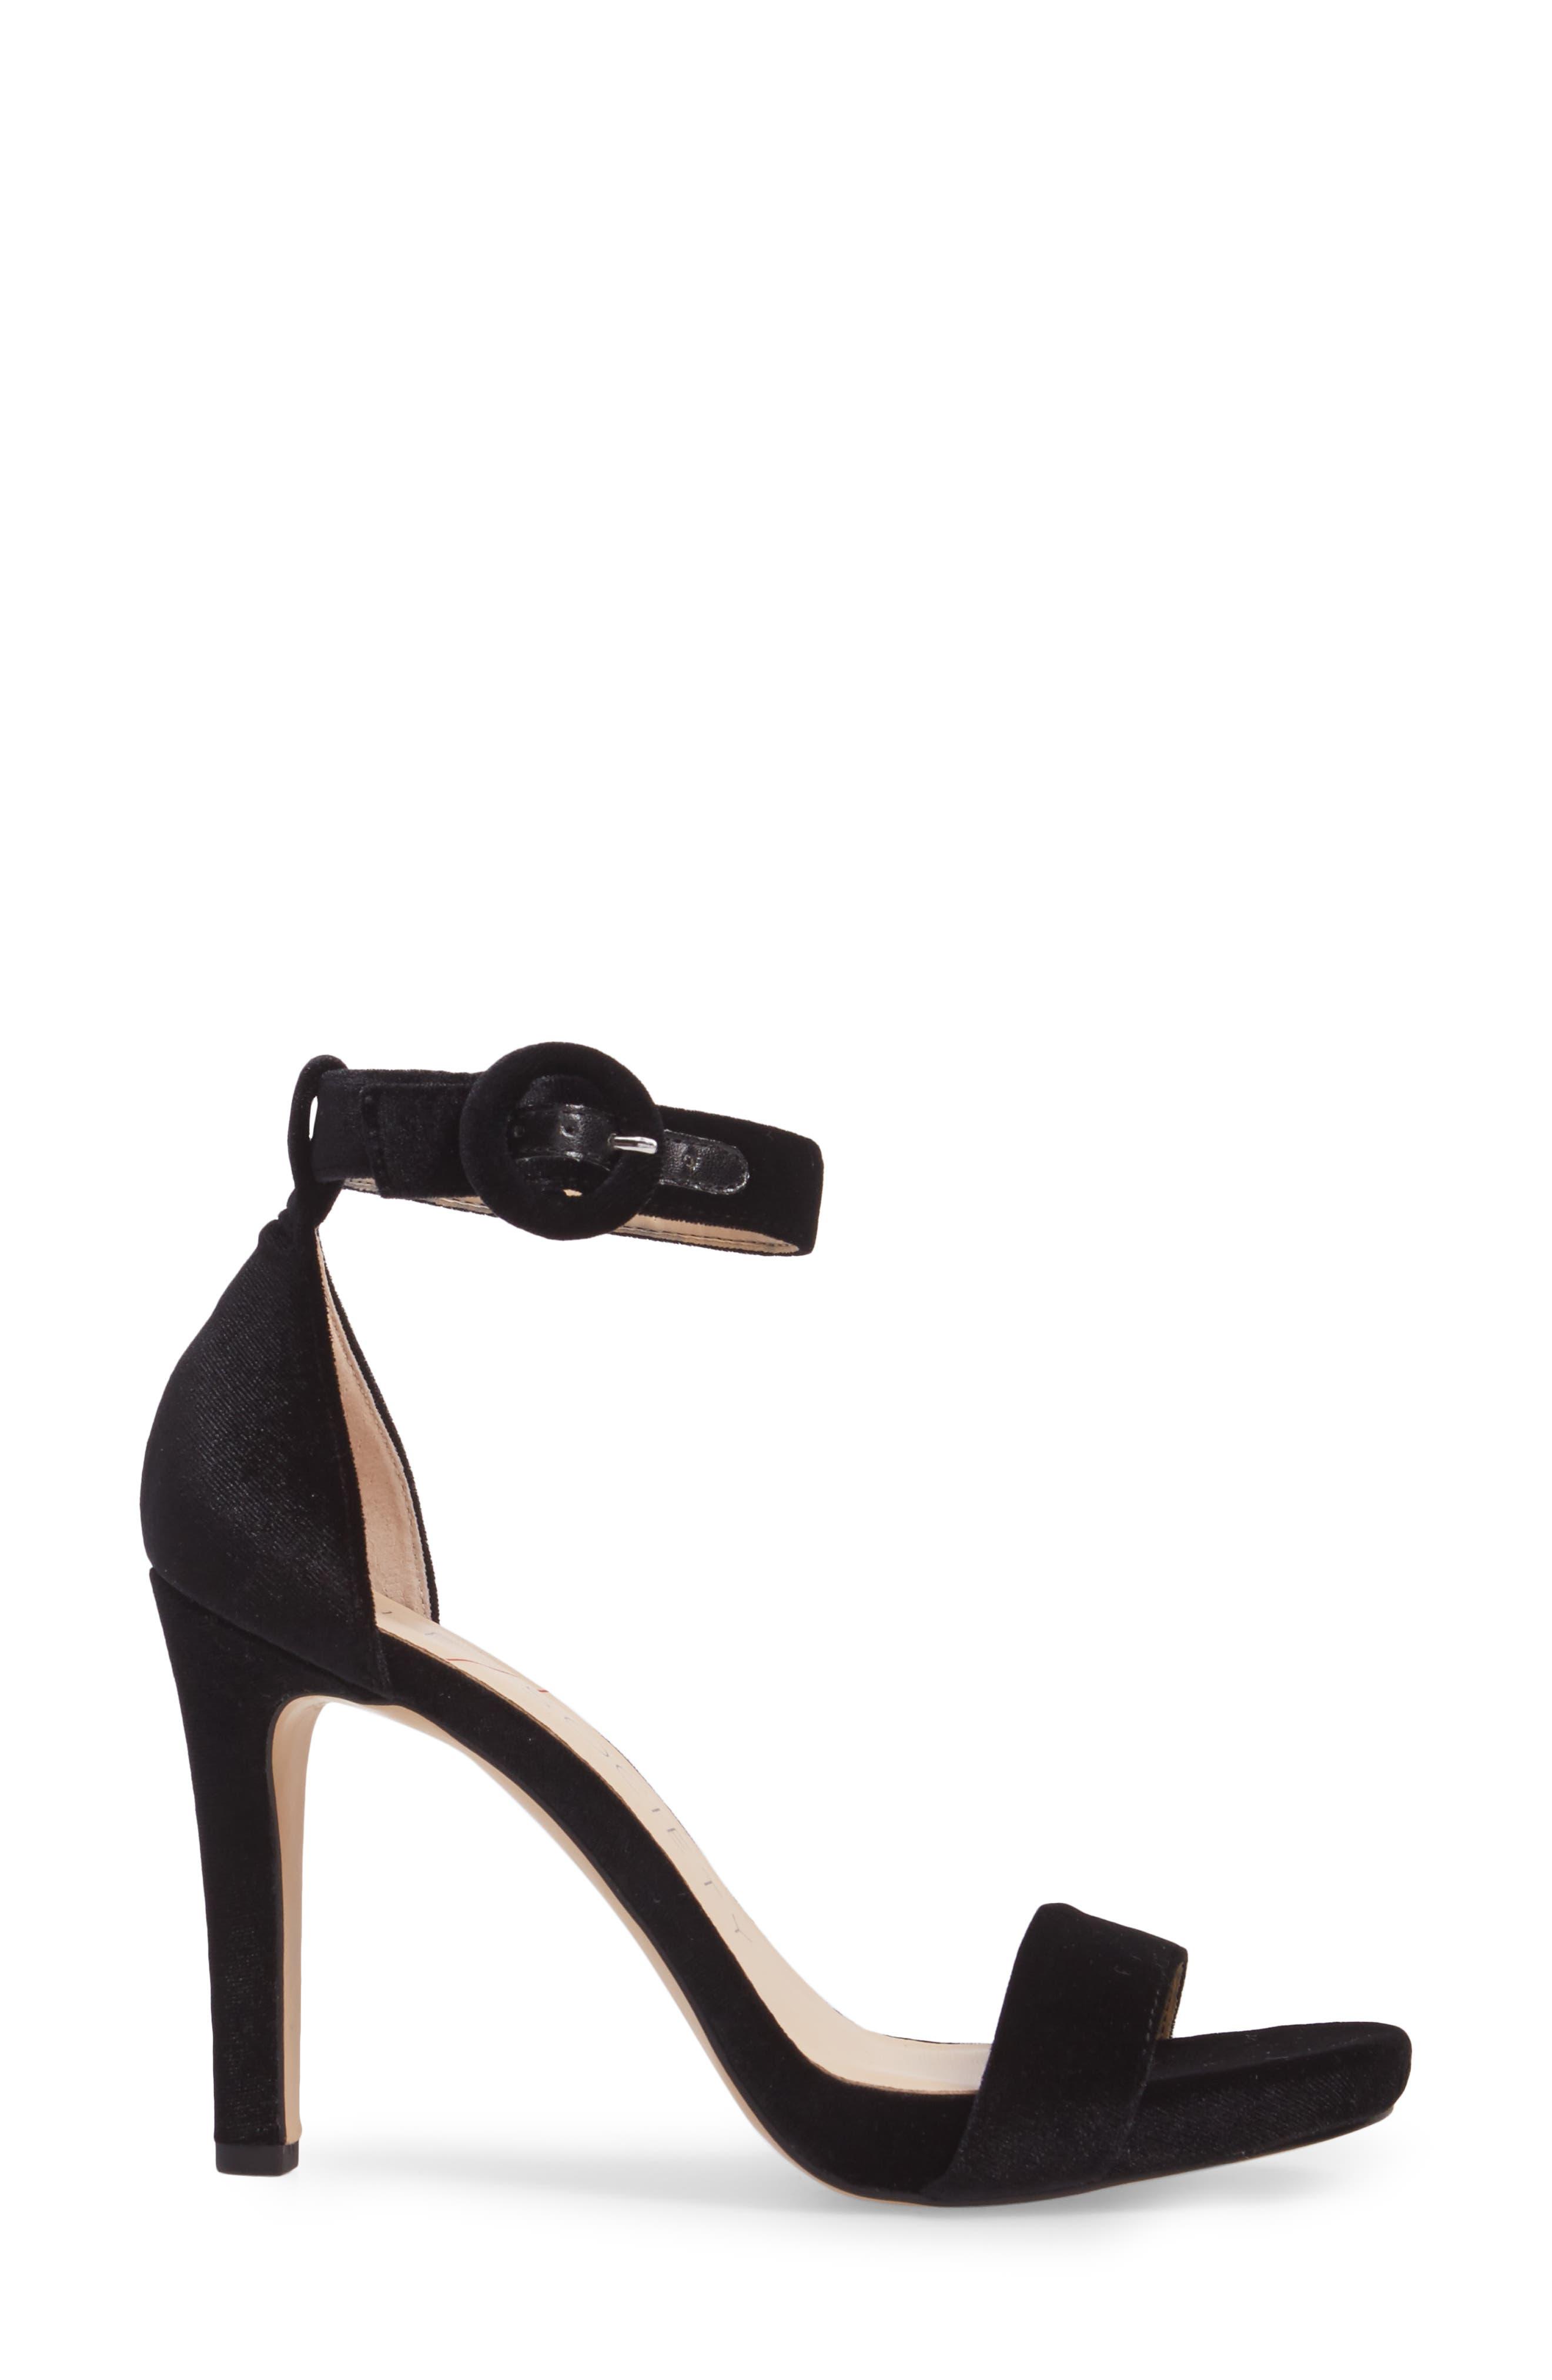 Emelia Ankle Strap Sandal,                             Alternate thumbnail 3, color,                             Black